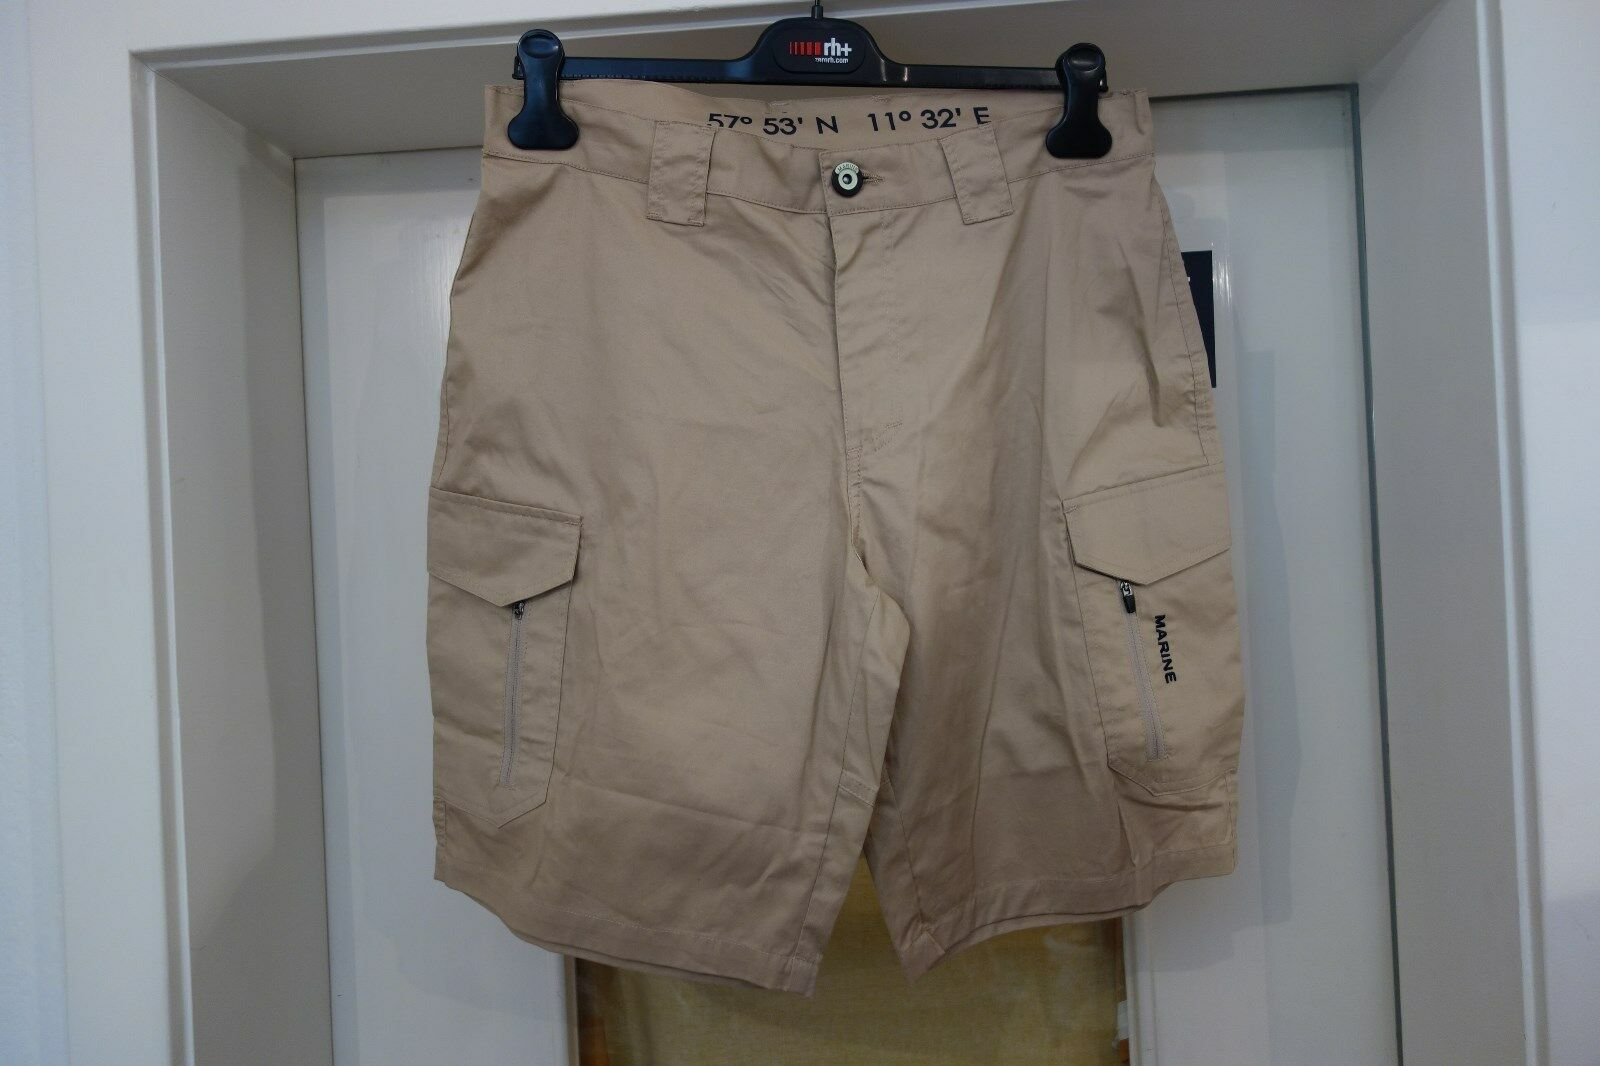 Marineshort  Pantaloni da Corsa Pantaloni per Tempo Libero Ciclismo Nuovo, TGL M  classic fashion